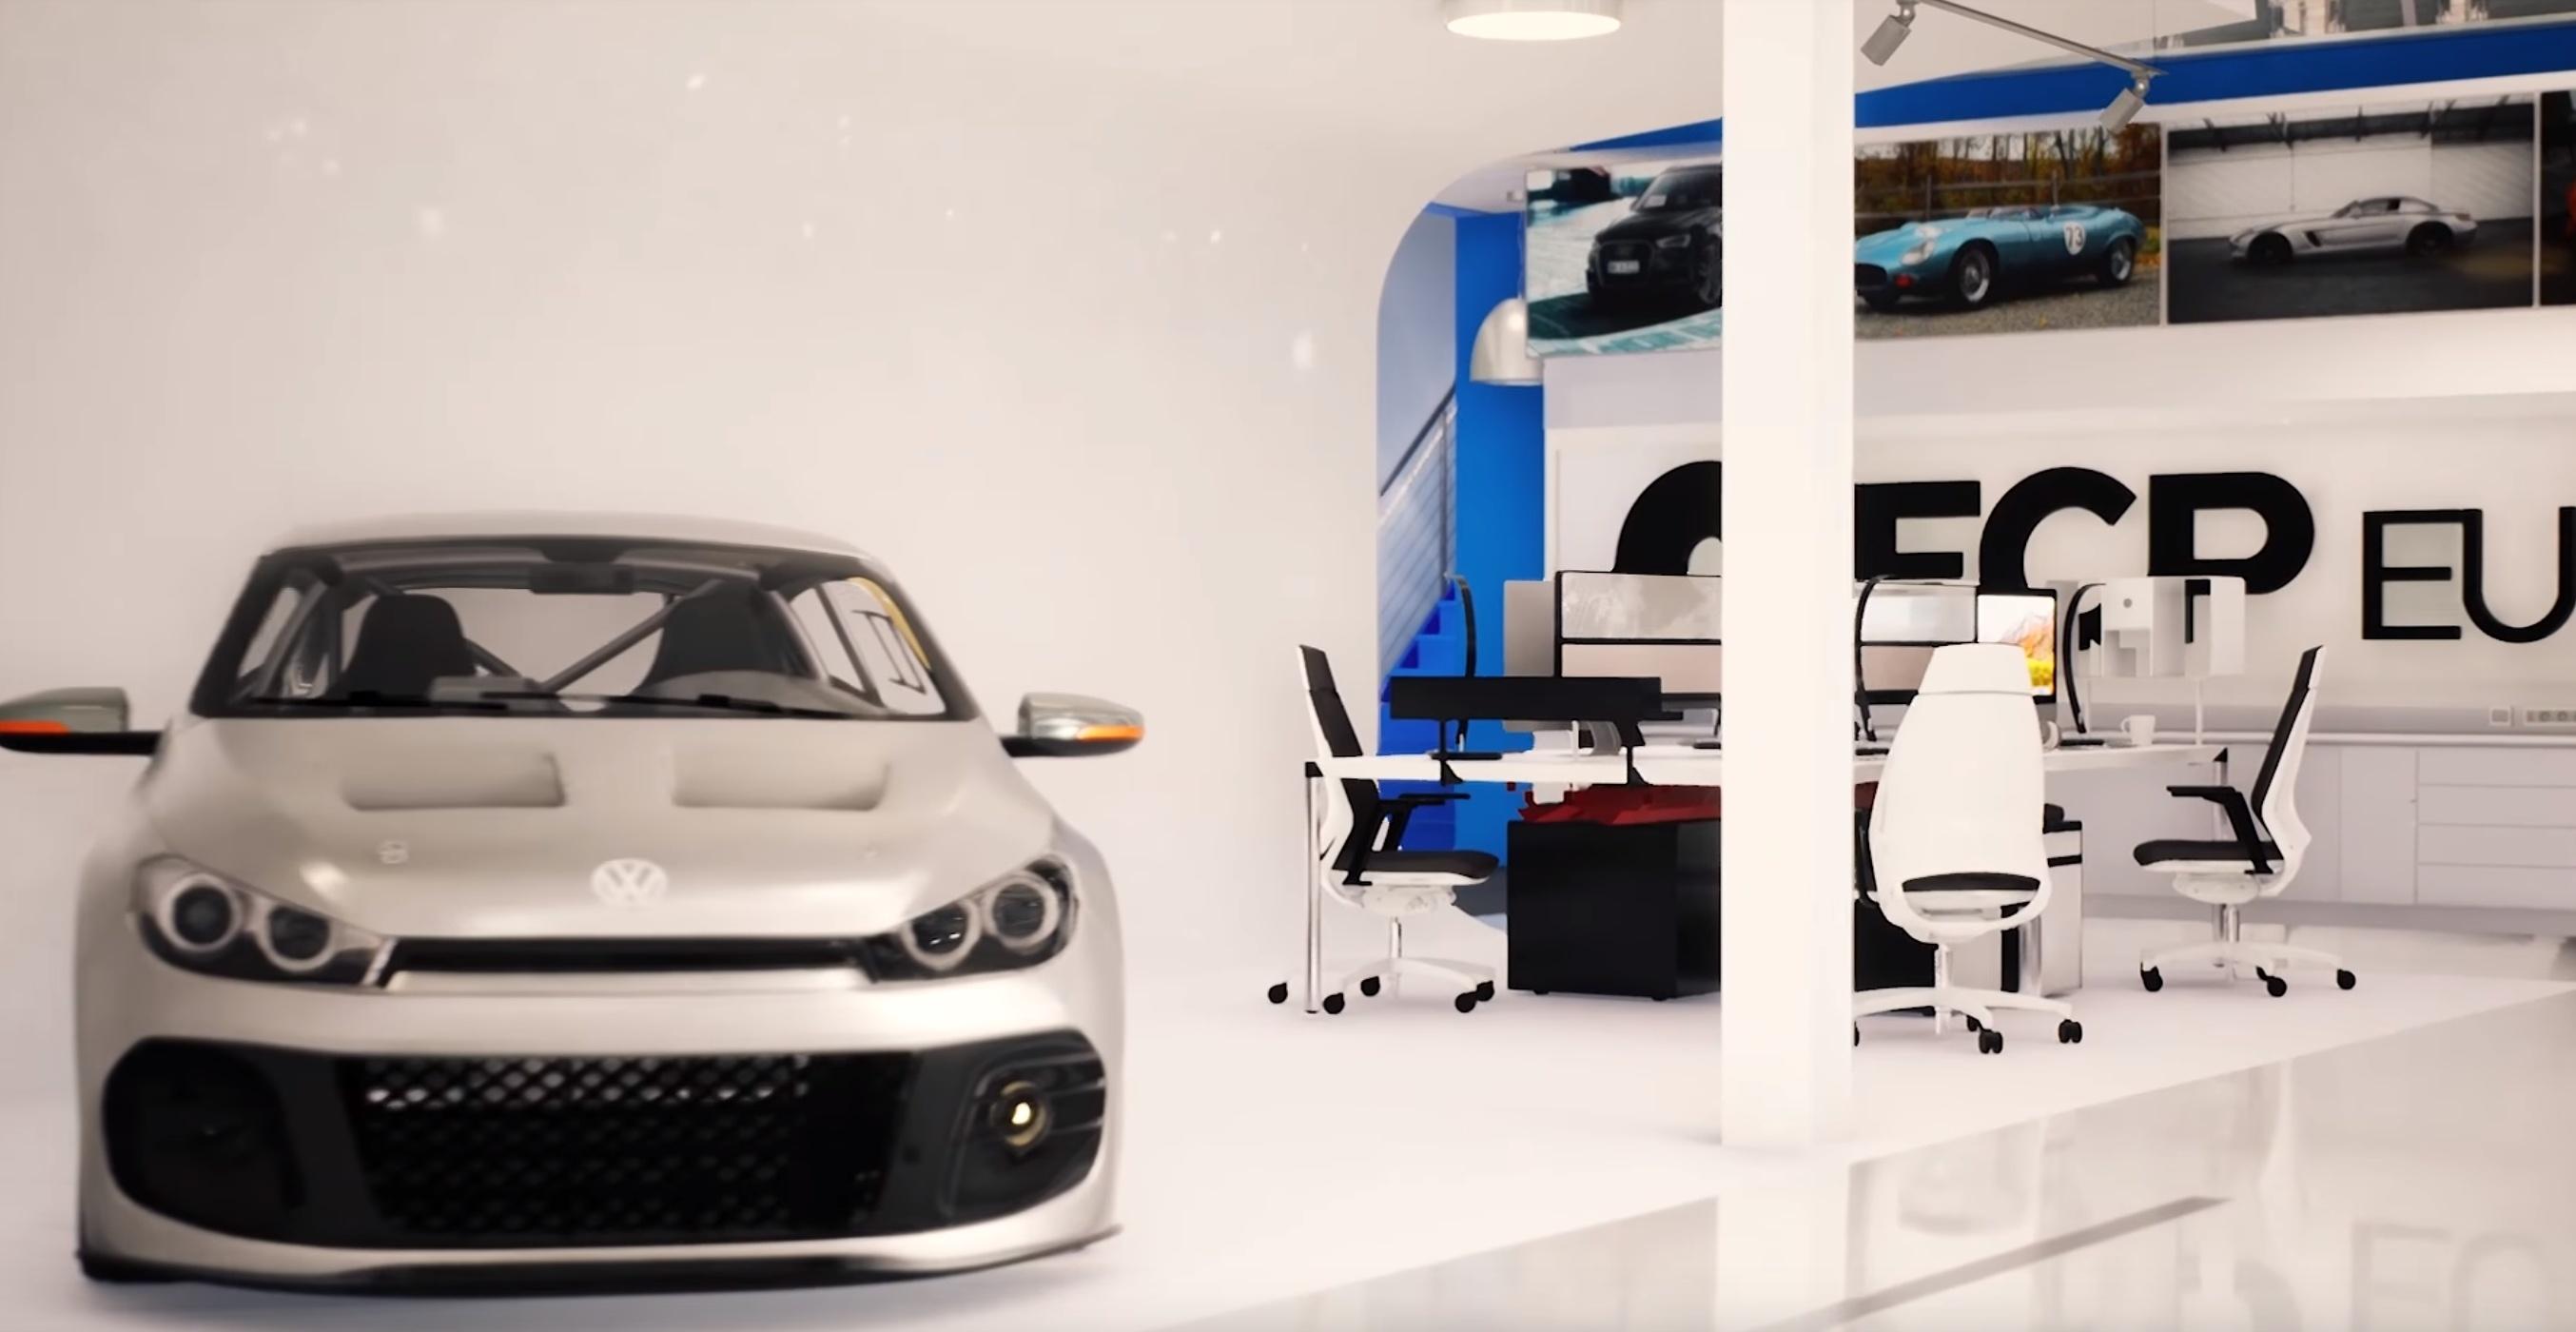 fcp-euro-expansion-content-studio-2